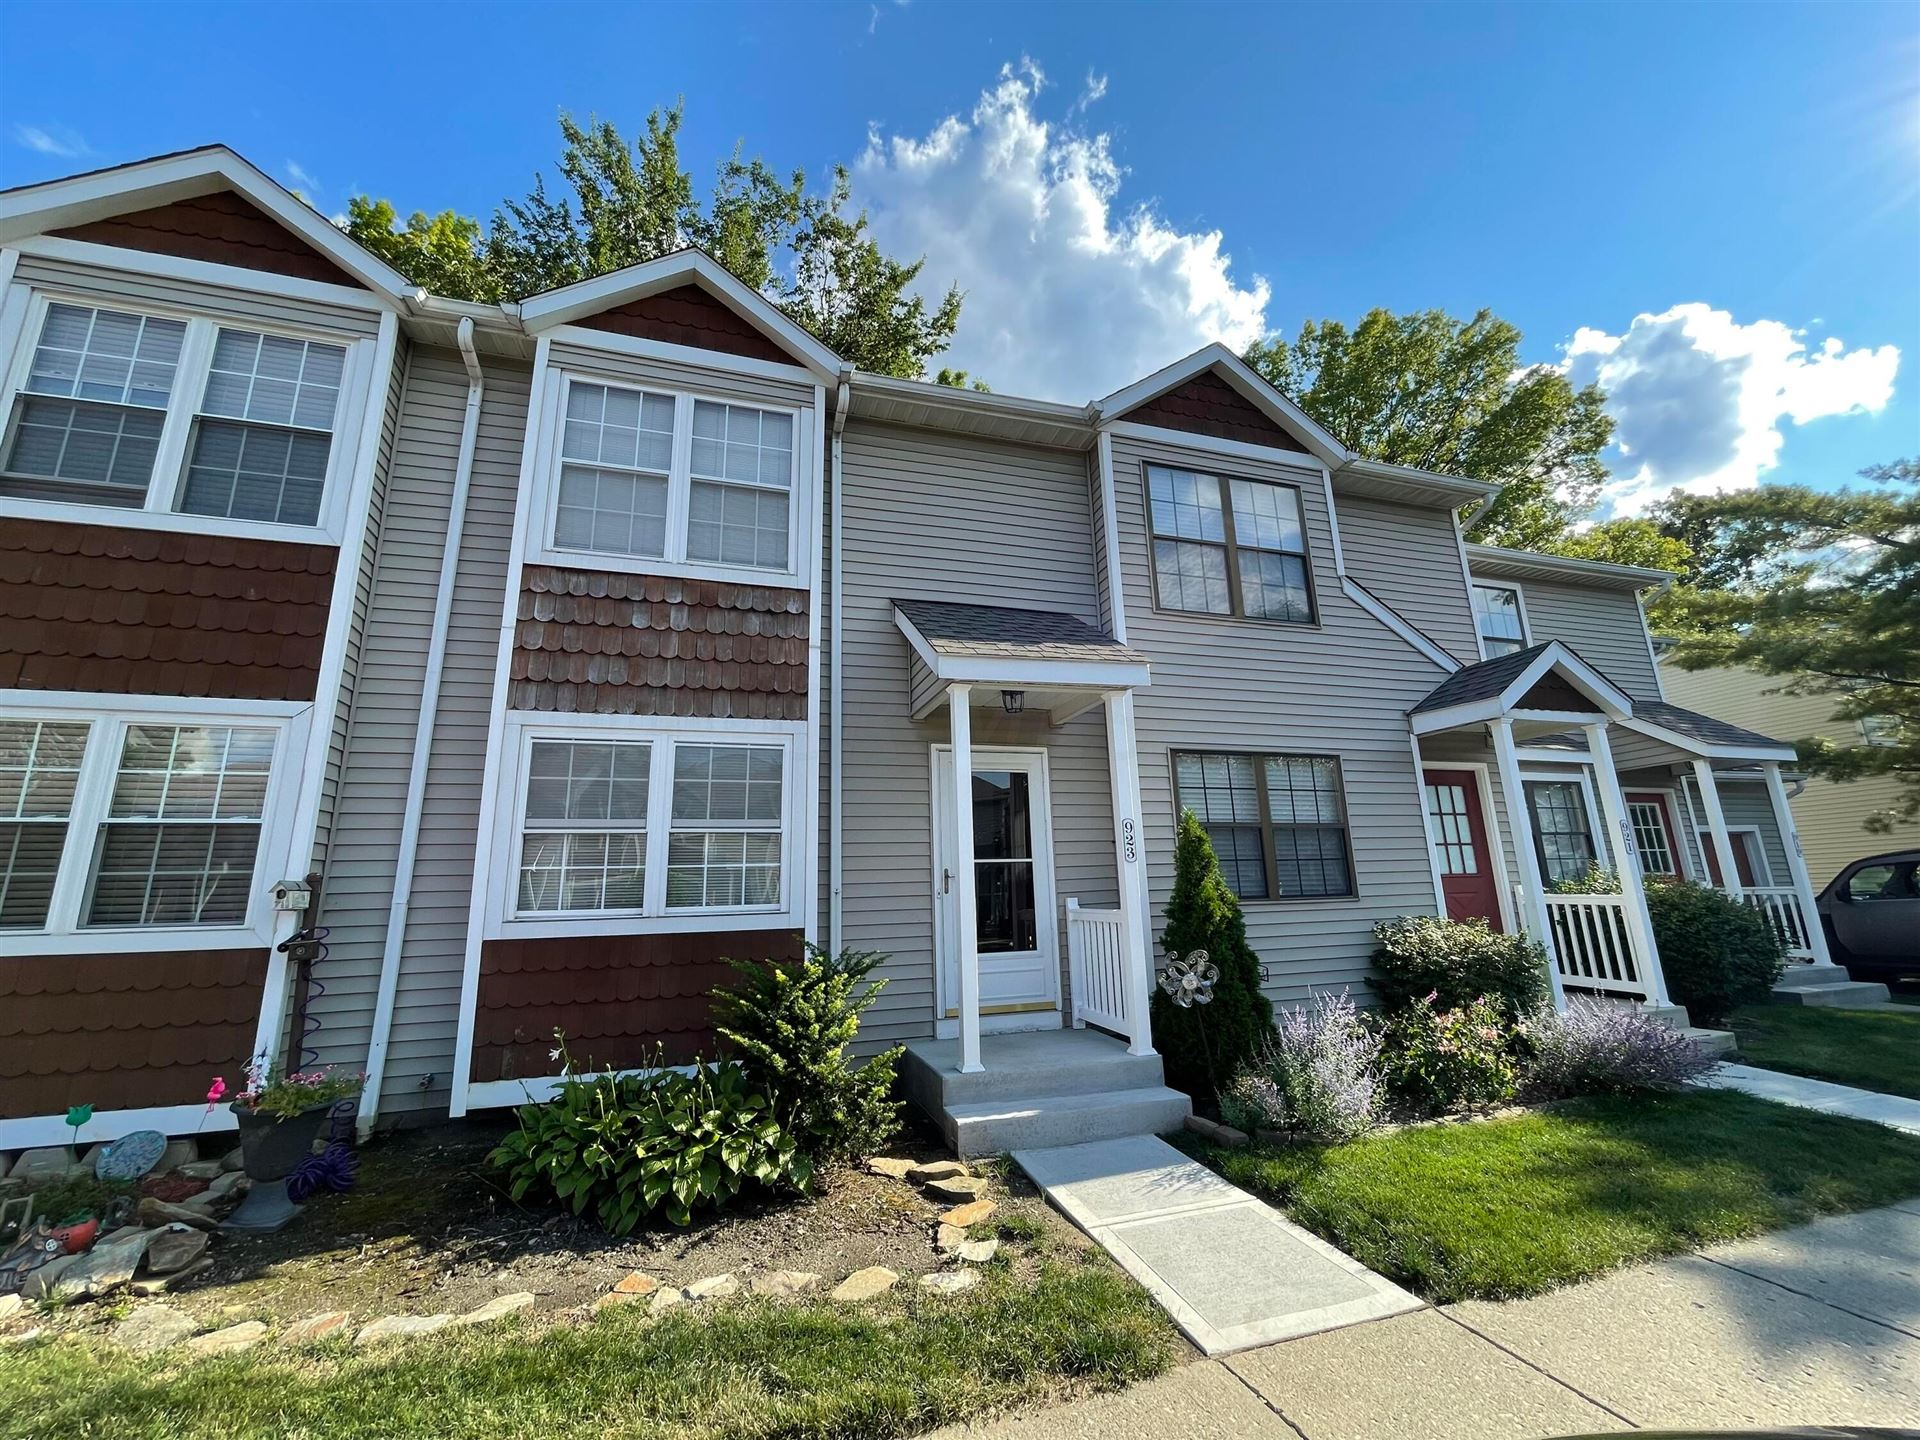 Photo of 923 Noddymill Lane E #35D, Worthington, OH 43085 (MLS # 221029946)